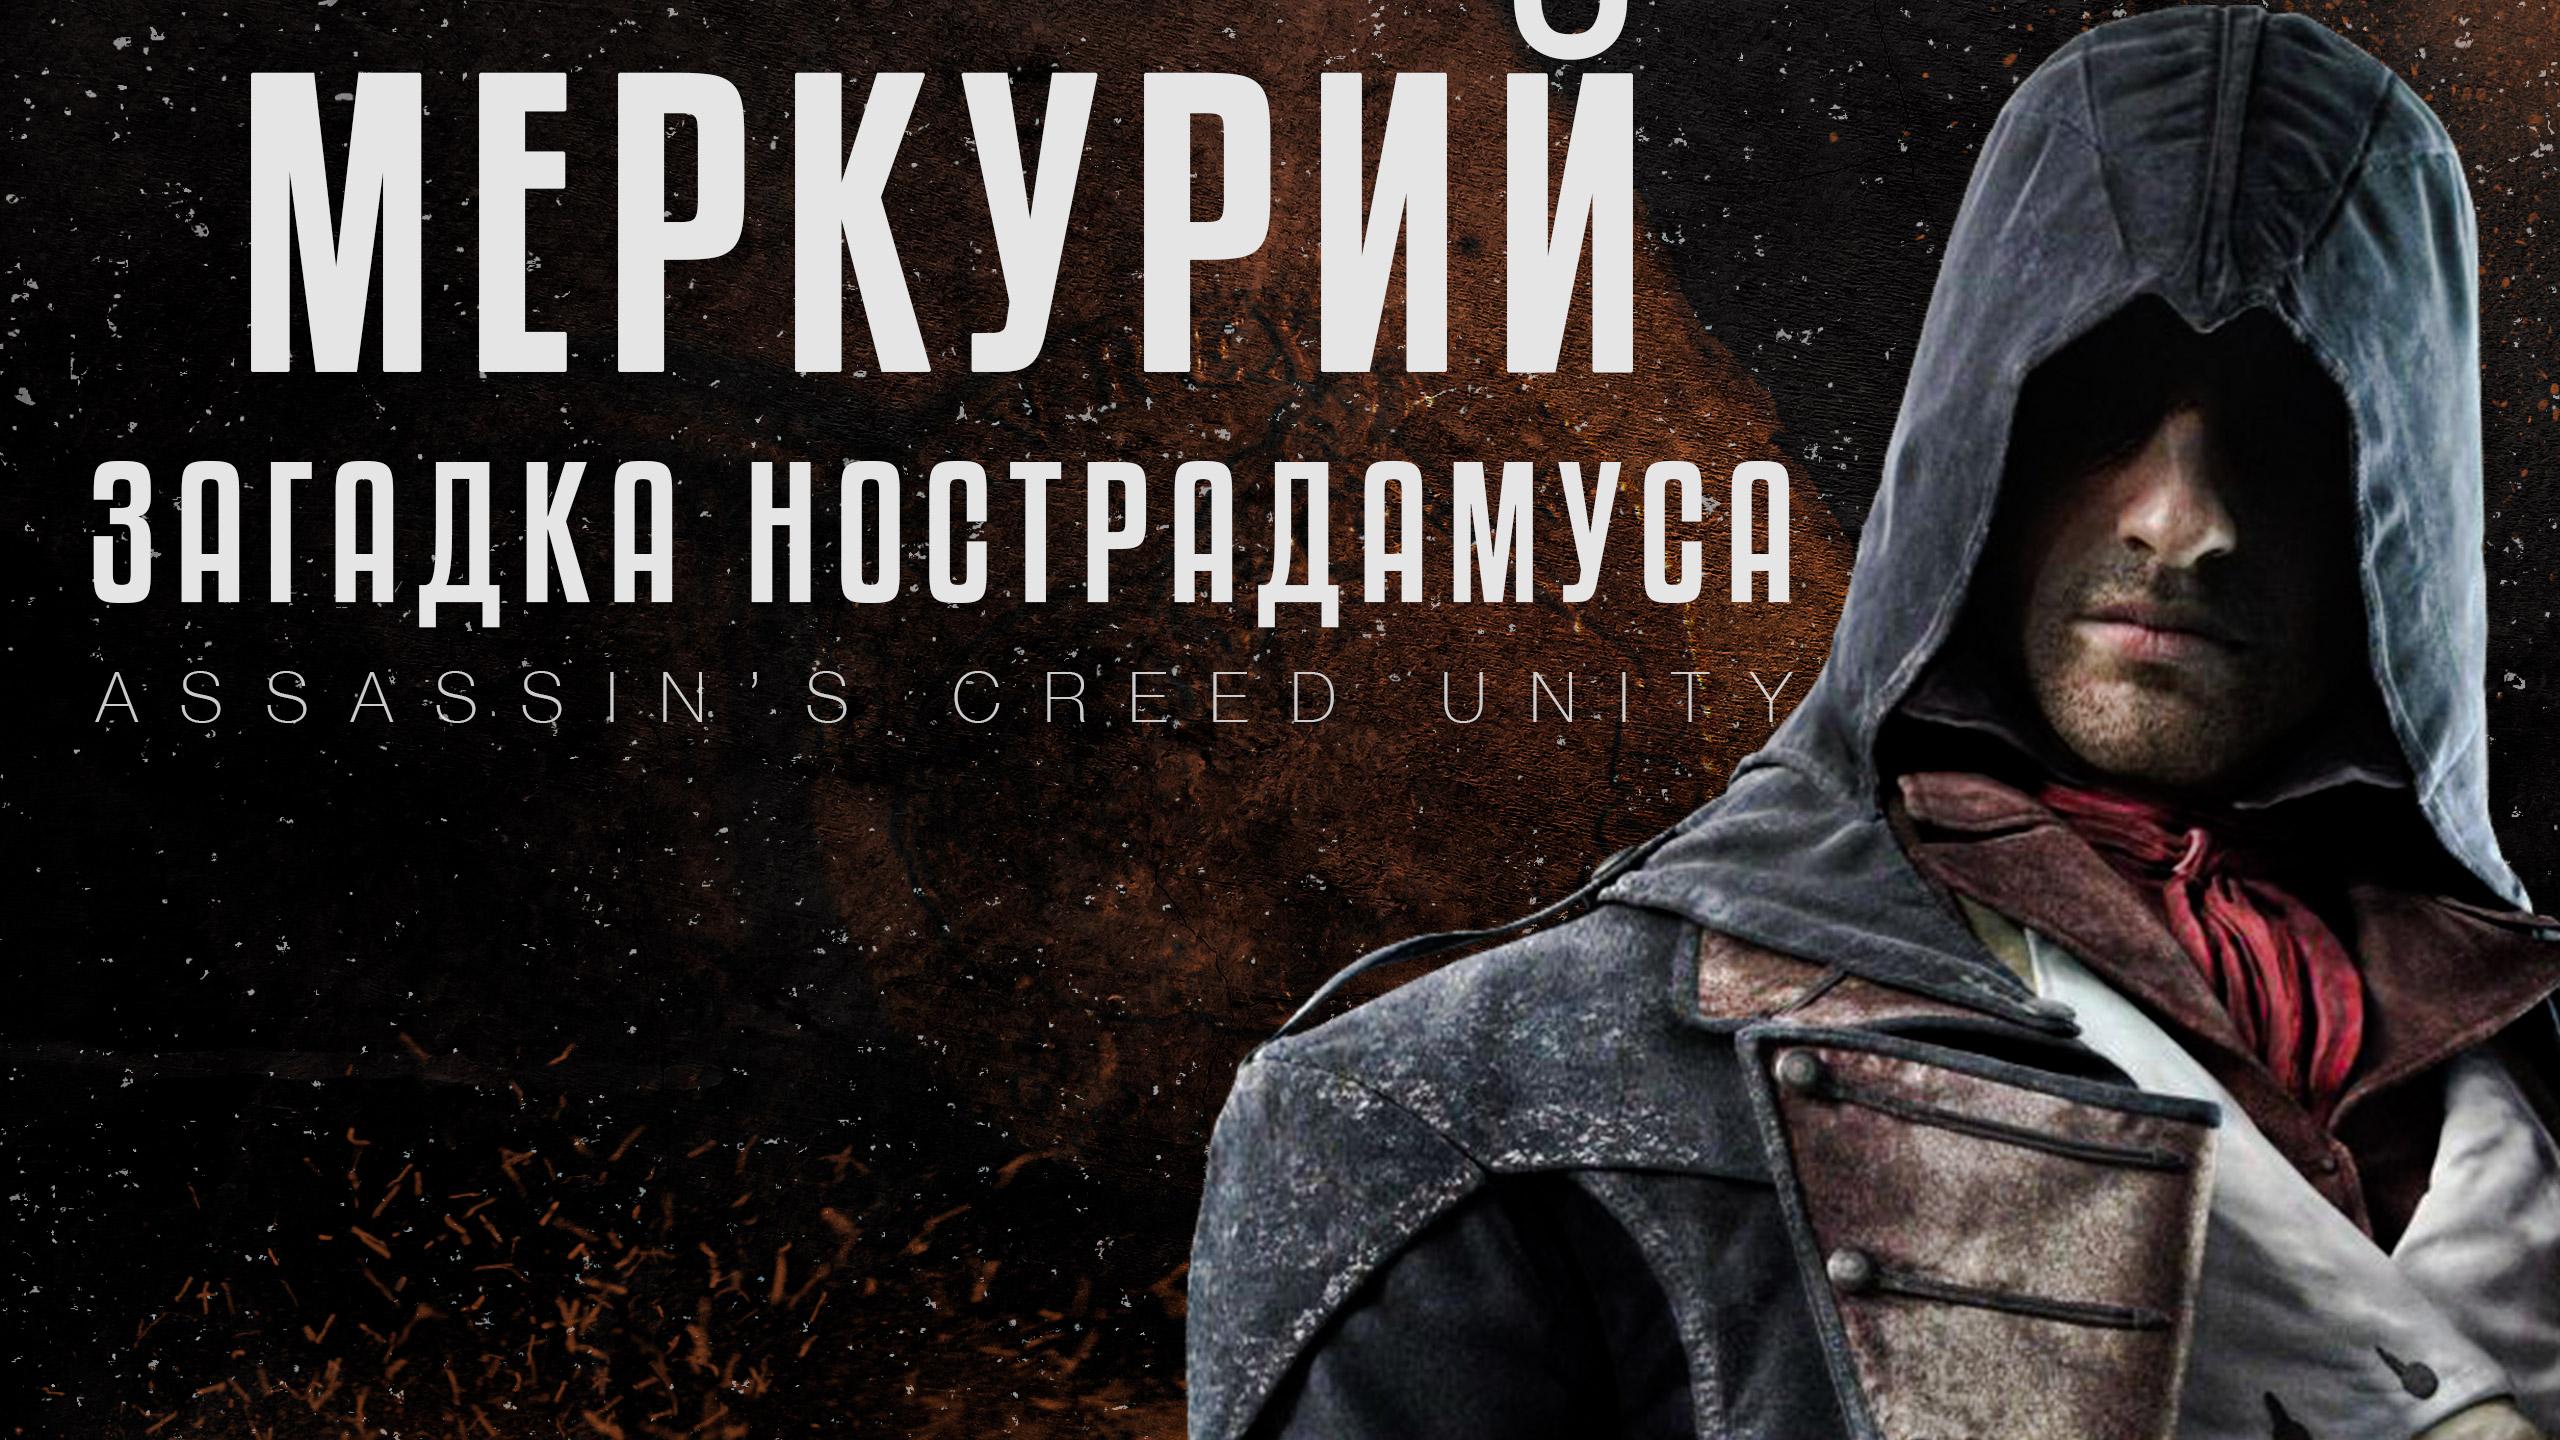 Нострадамус в игре Assassin's Creed Unity (Меркурий)